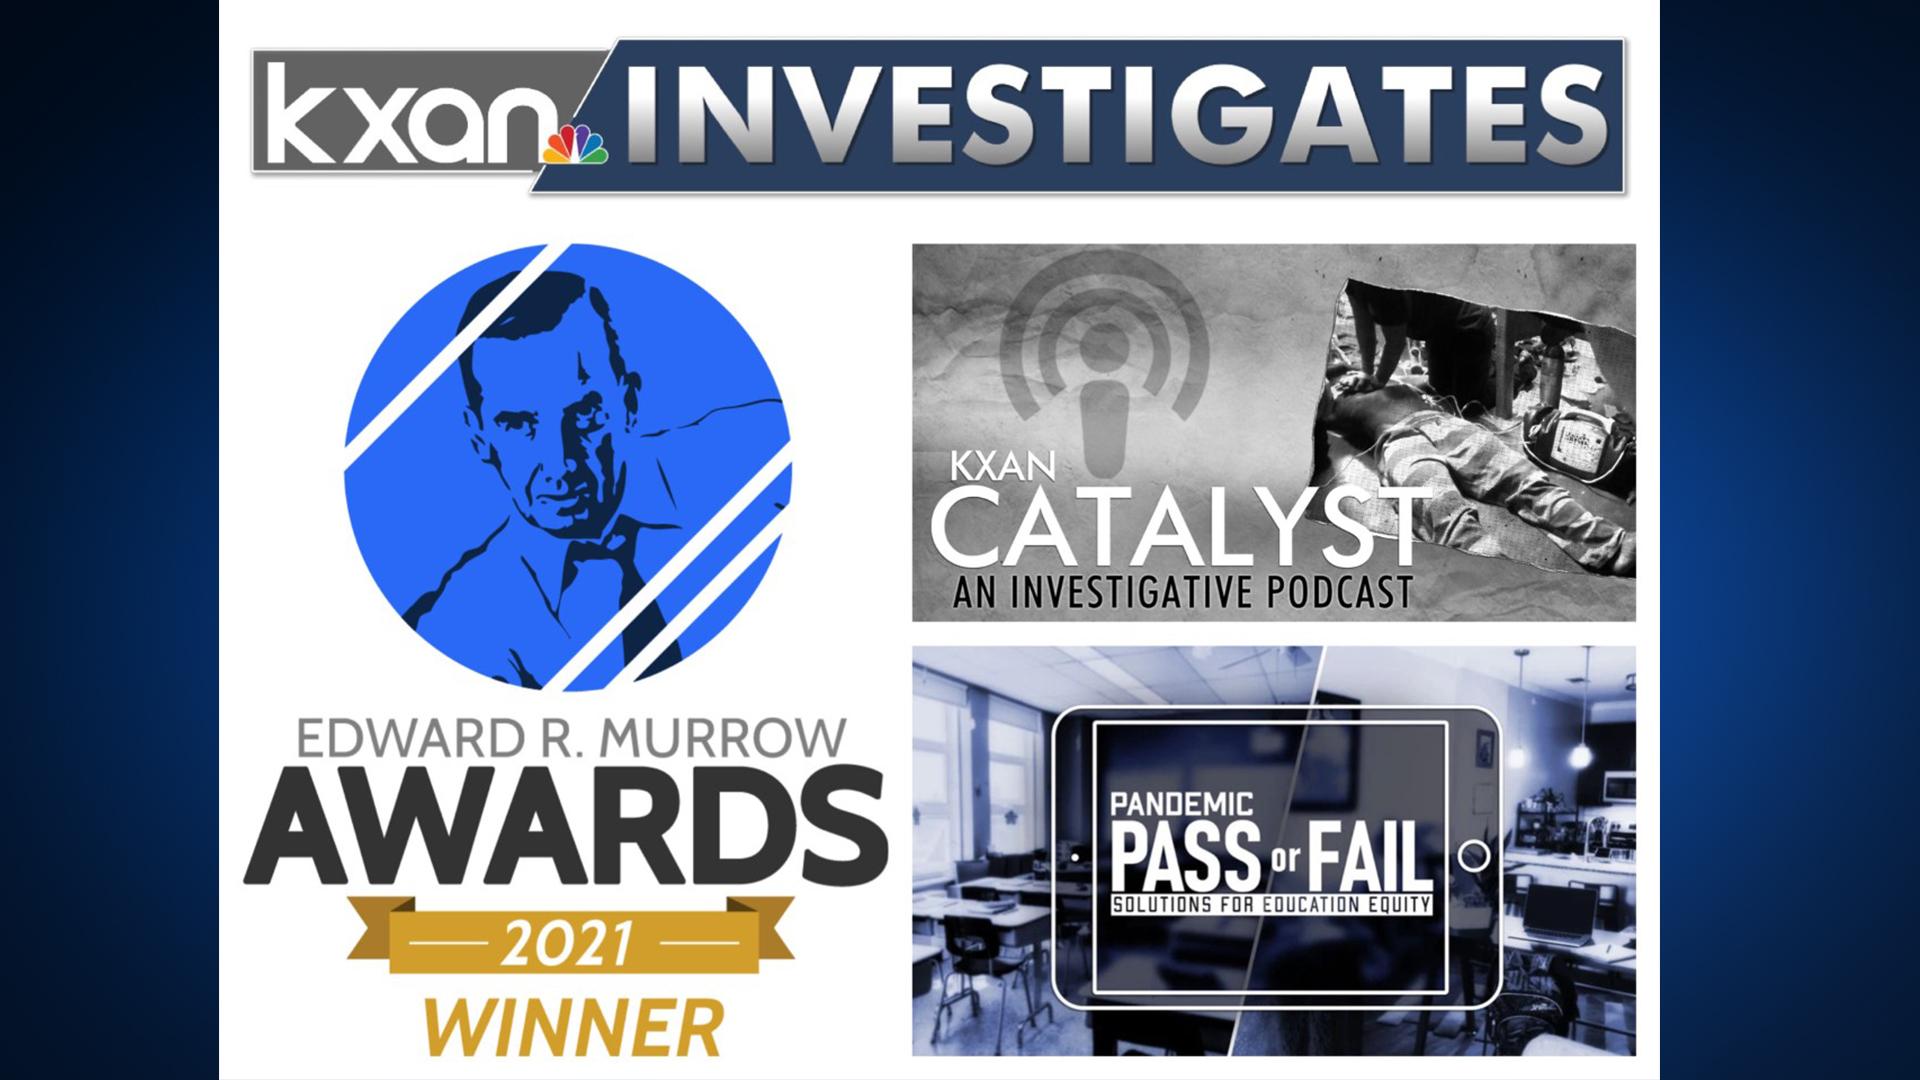 KXAN team members won a total of four regional Edward R. Murrow awards in 2021 (KXAN Photo)